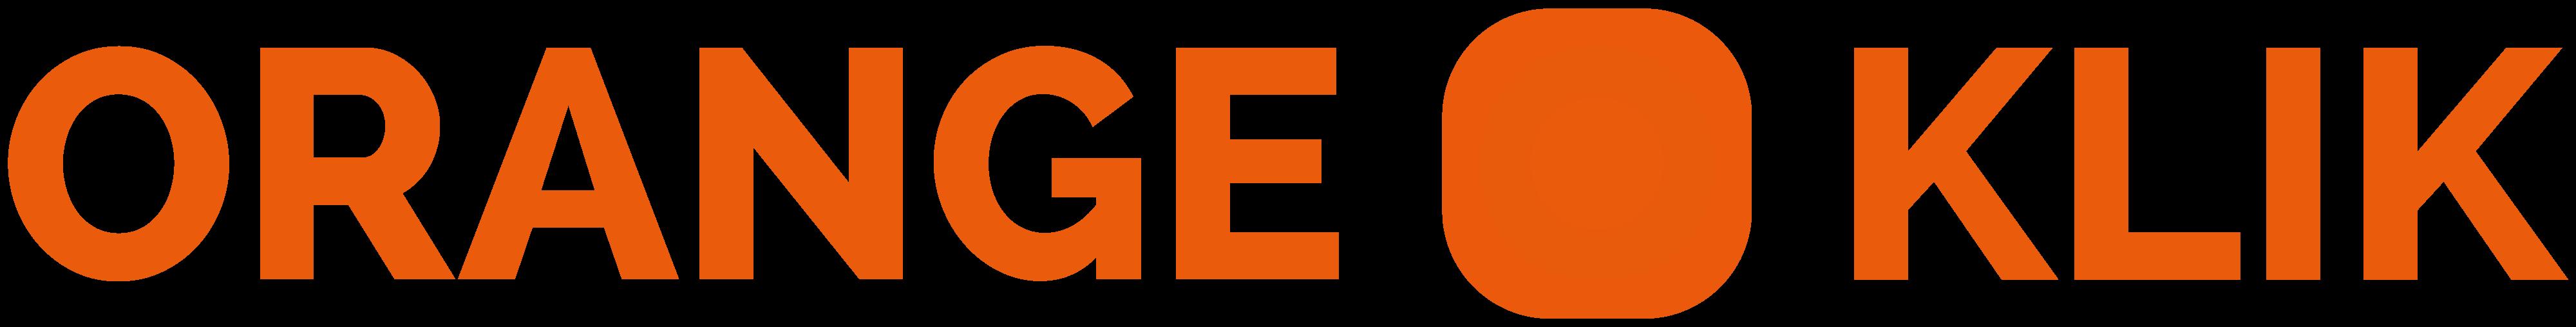 orange klik logo orange